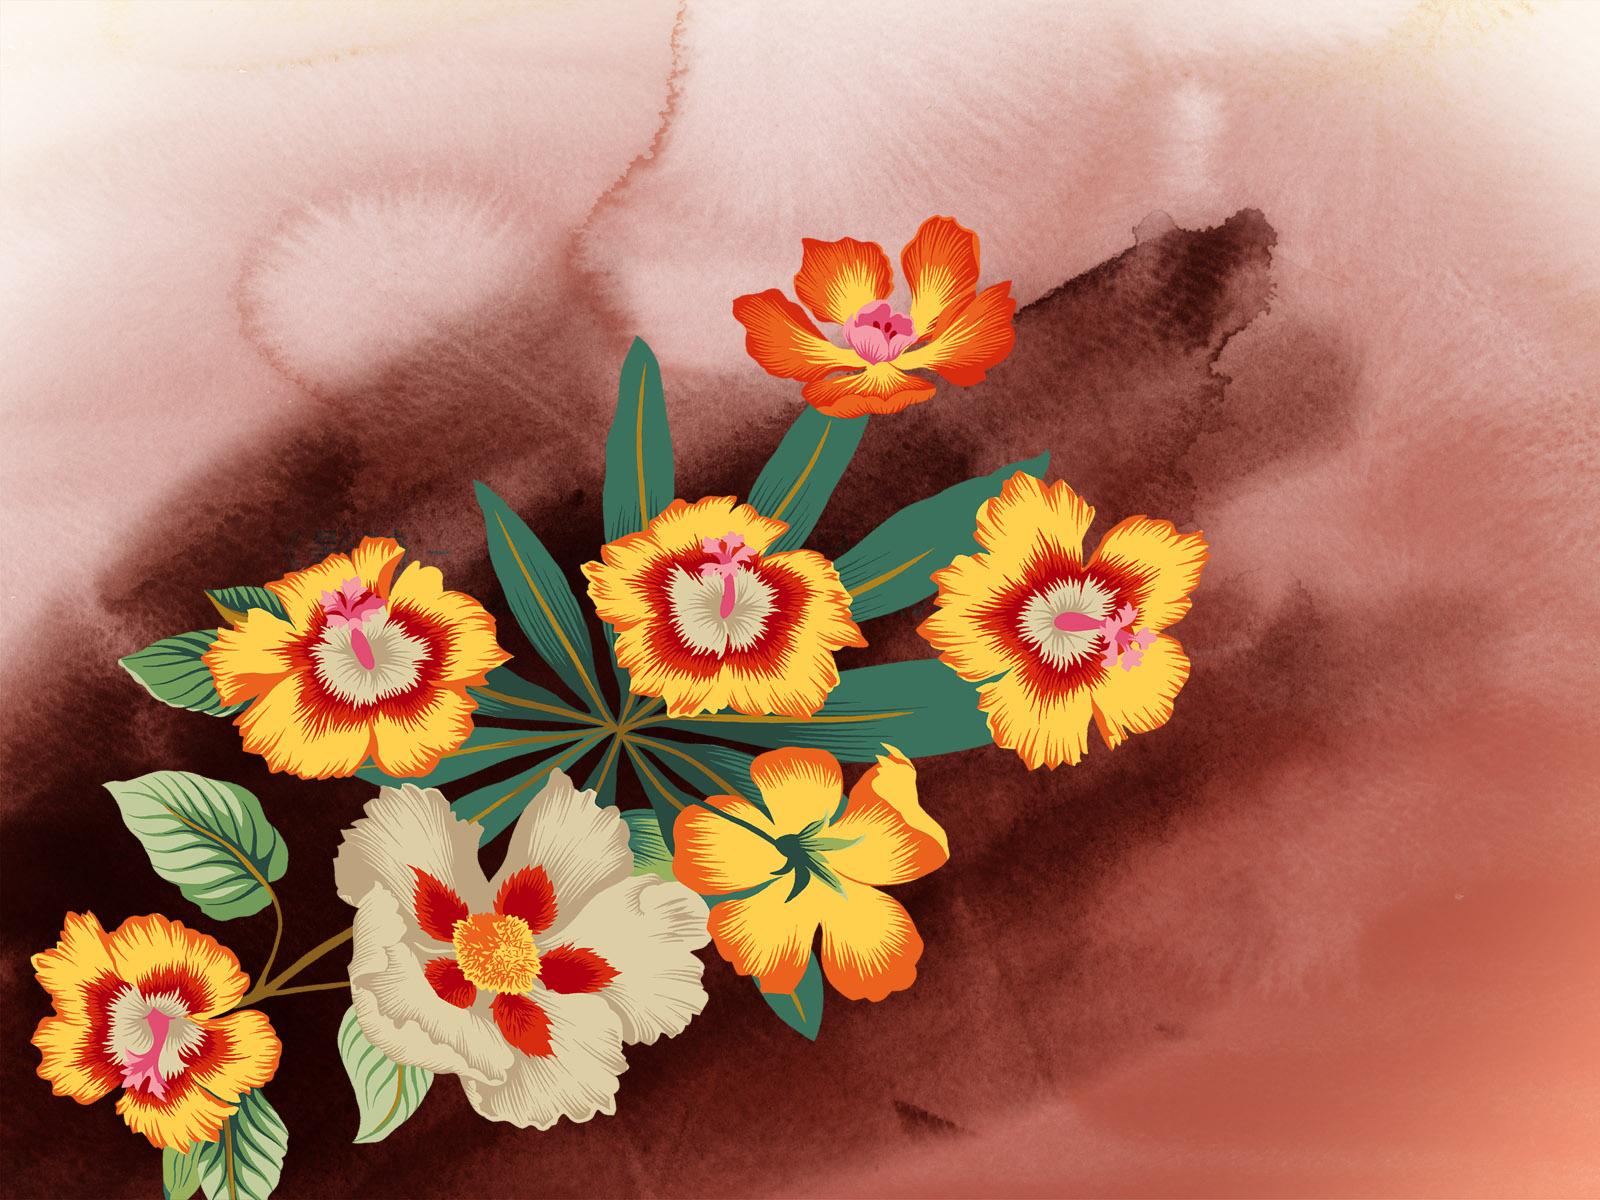 http://1.bp.blogspot.com/-SgaTbQLoX44/TcwUpUMlGmI/AAAAAAAACMQ/eUKxp6qeP8U/s1600/Flowers%20(19).jpg